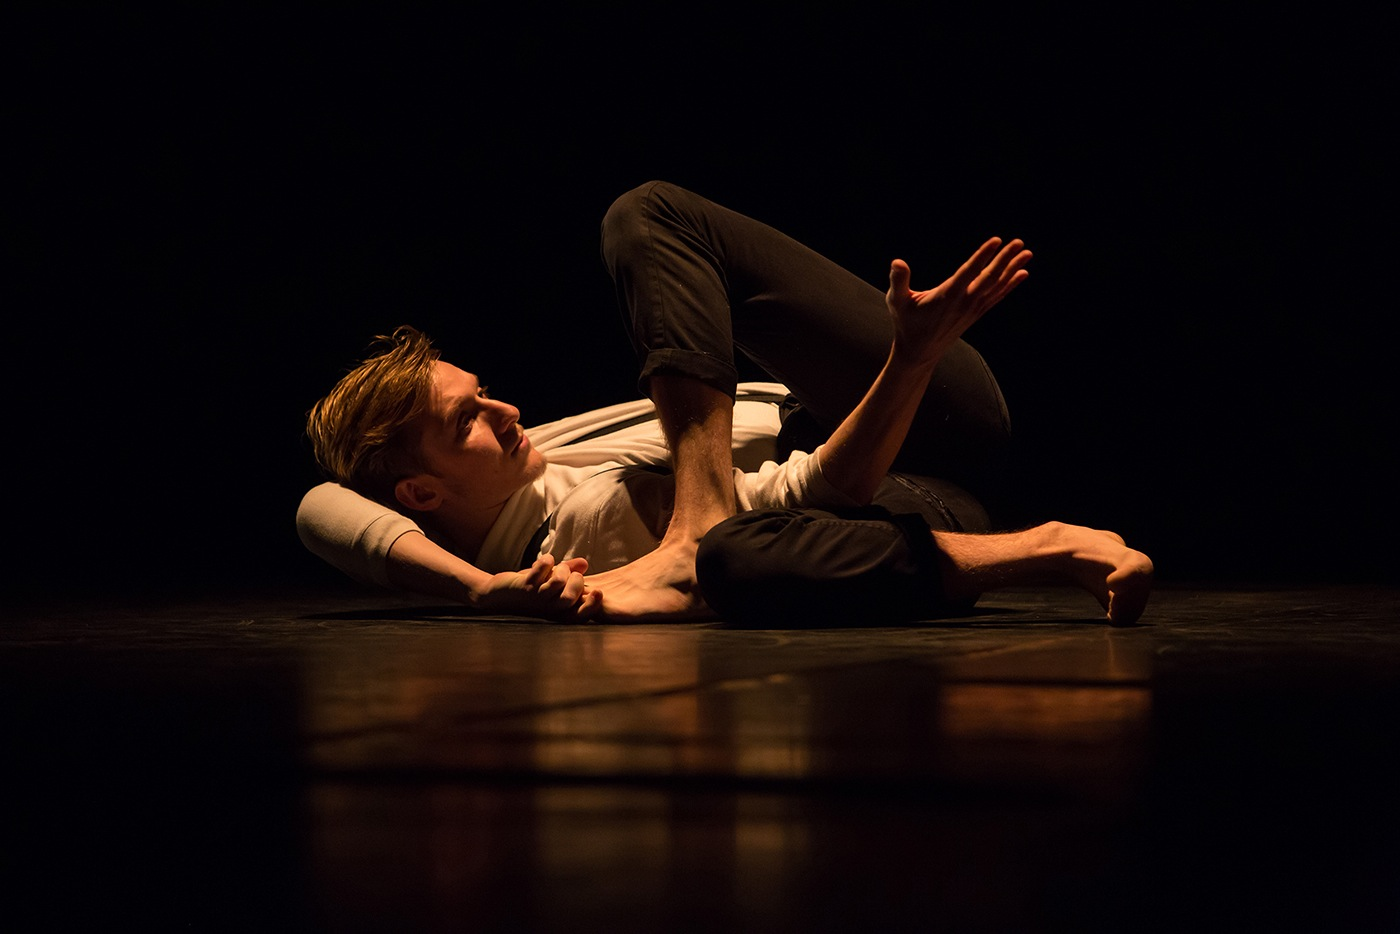 photographe-reportage-danse-avec-ton-crous-guillaume-heraud-028-small